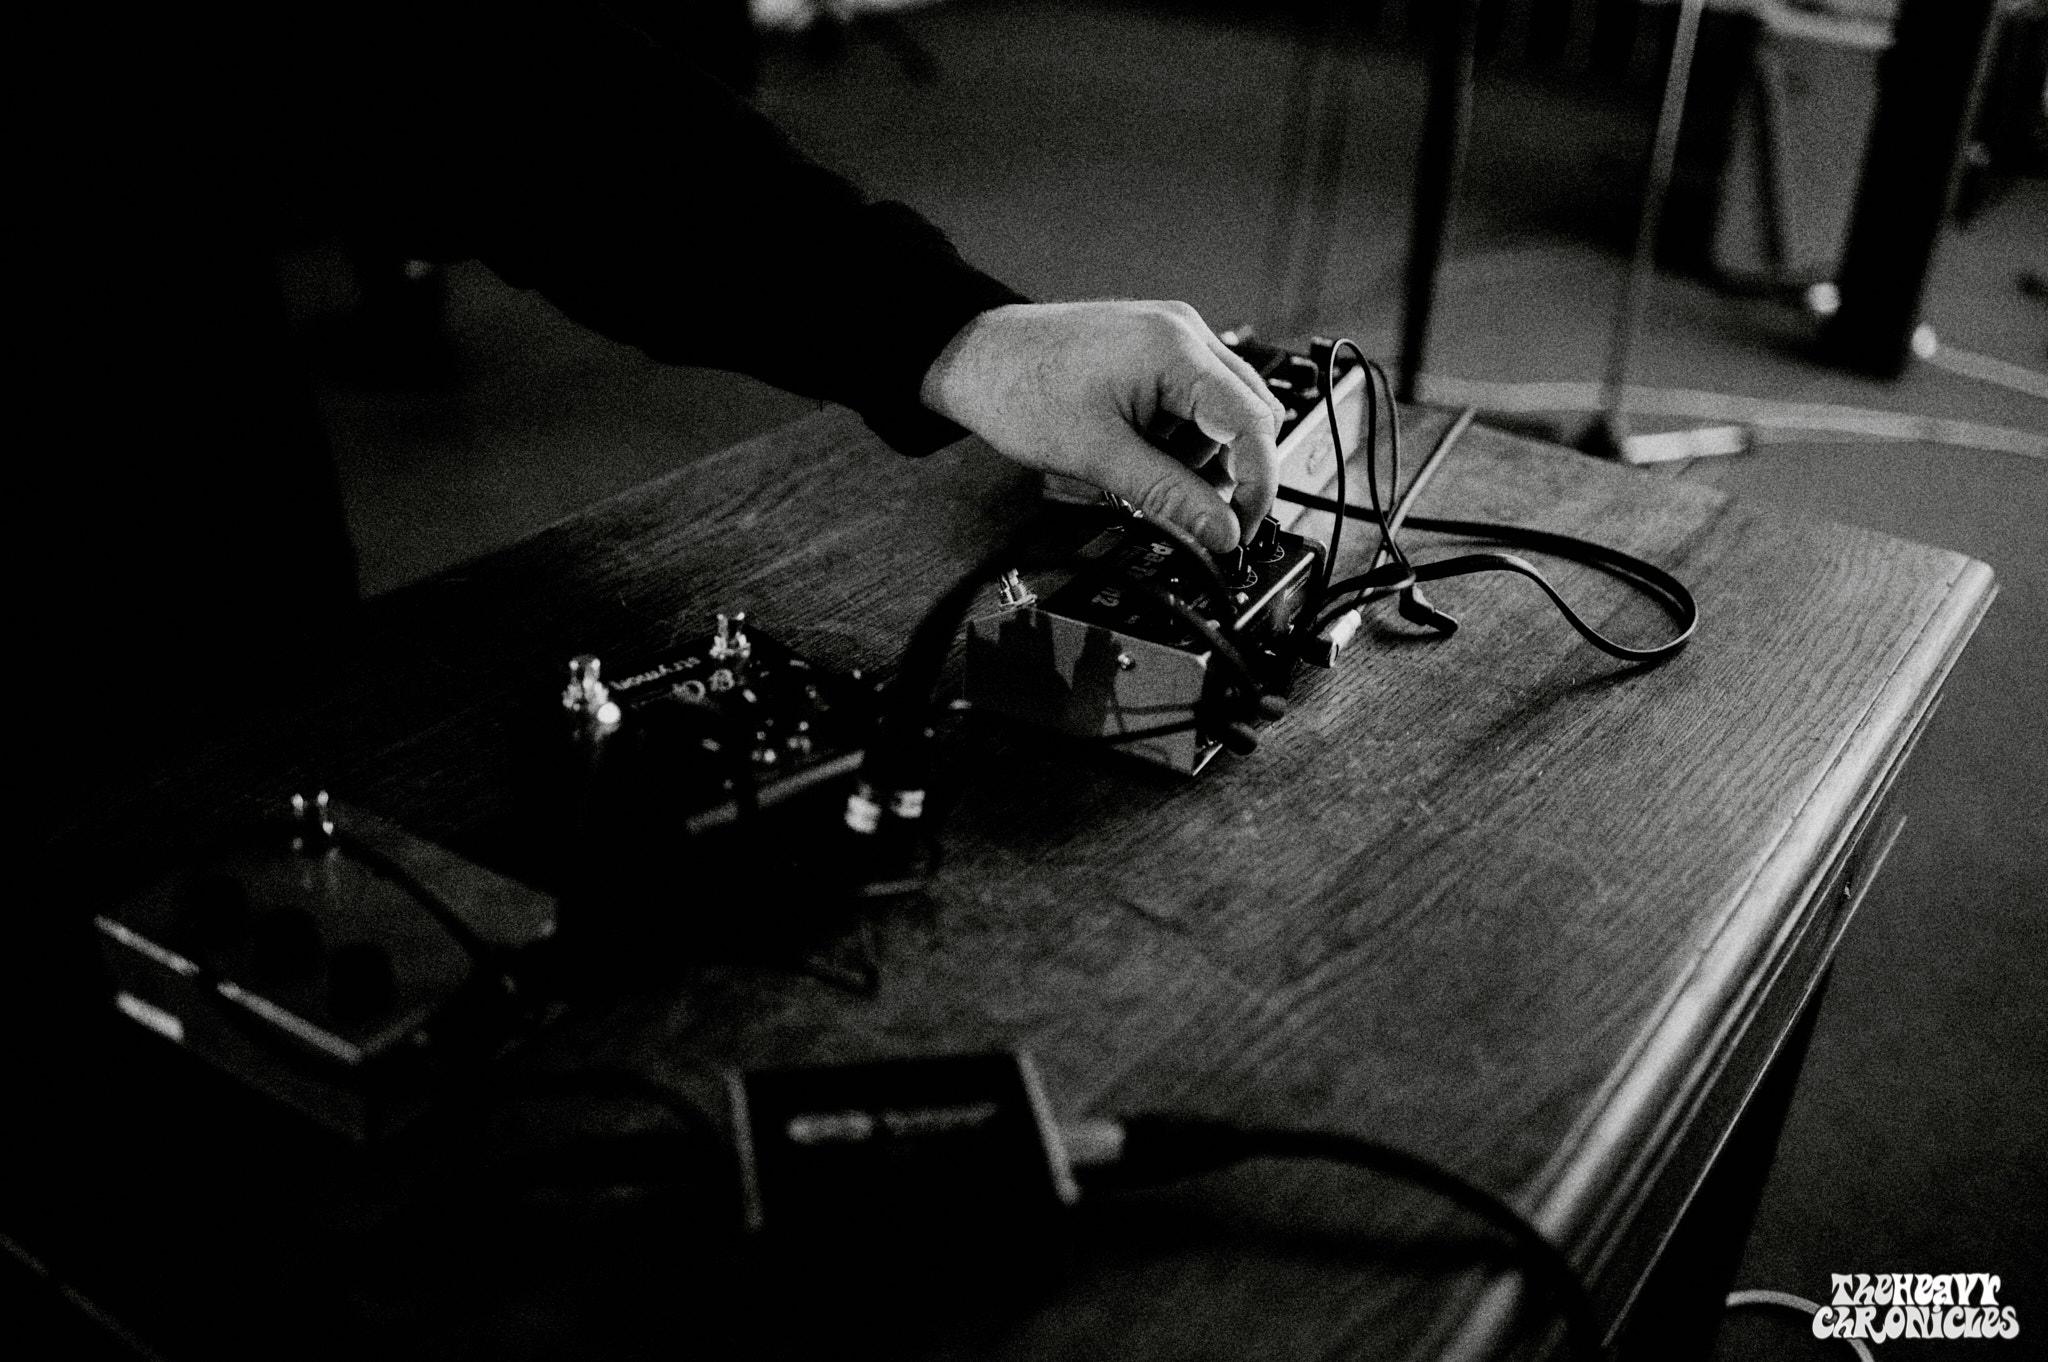 Elder-Studio-Black-Box-2019-Gael-Mathieu-The-Heavy-Chronicles-94